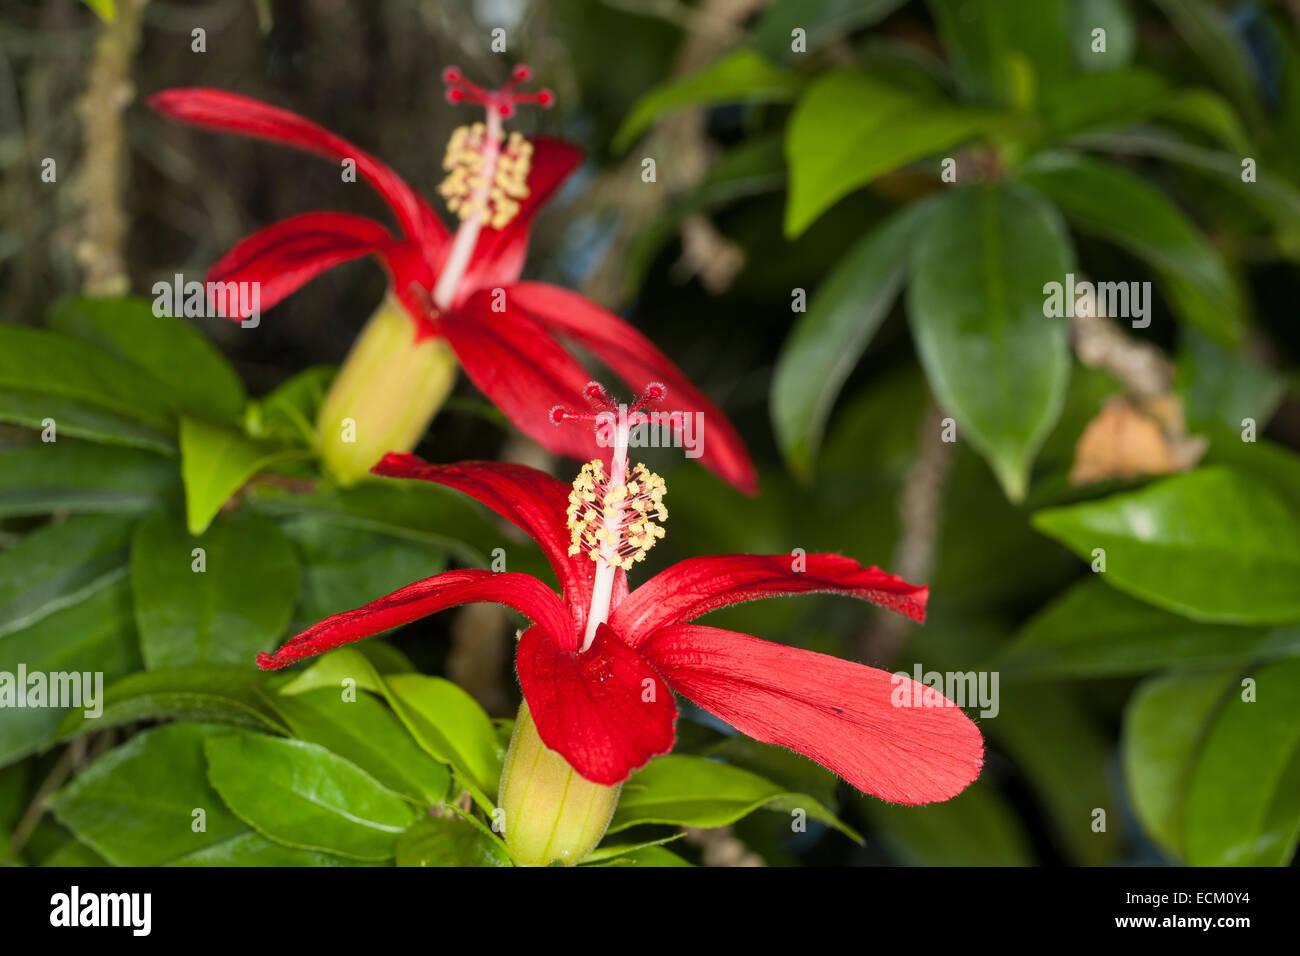 Hawaiian red hibiscus, Hawaiian hibiscus, hibiscus, Giant mallow, Rose Mallow, Hibiscus clayi, Hibiskus, Eibisch, - Stock Image